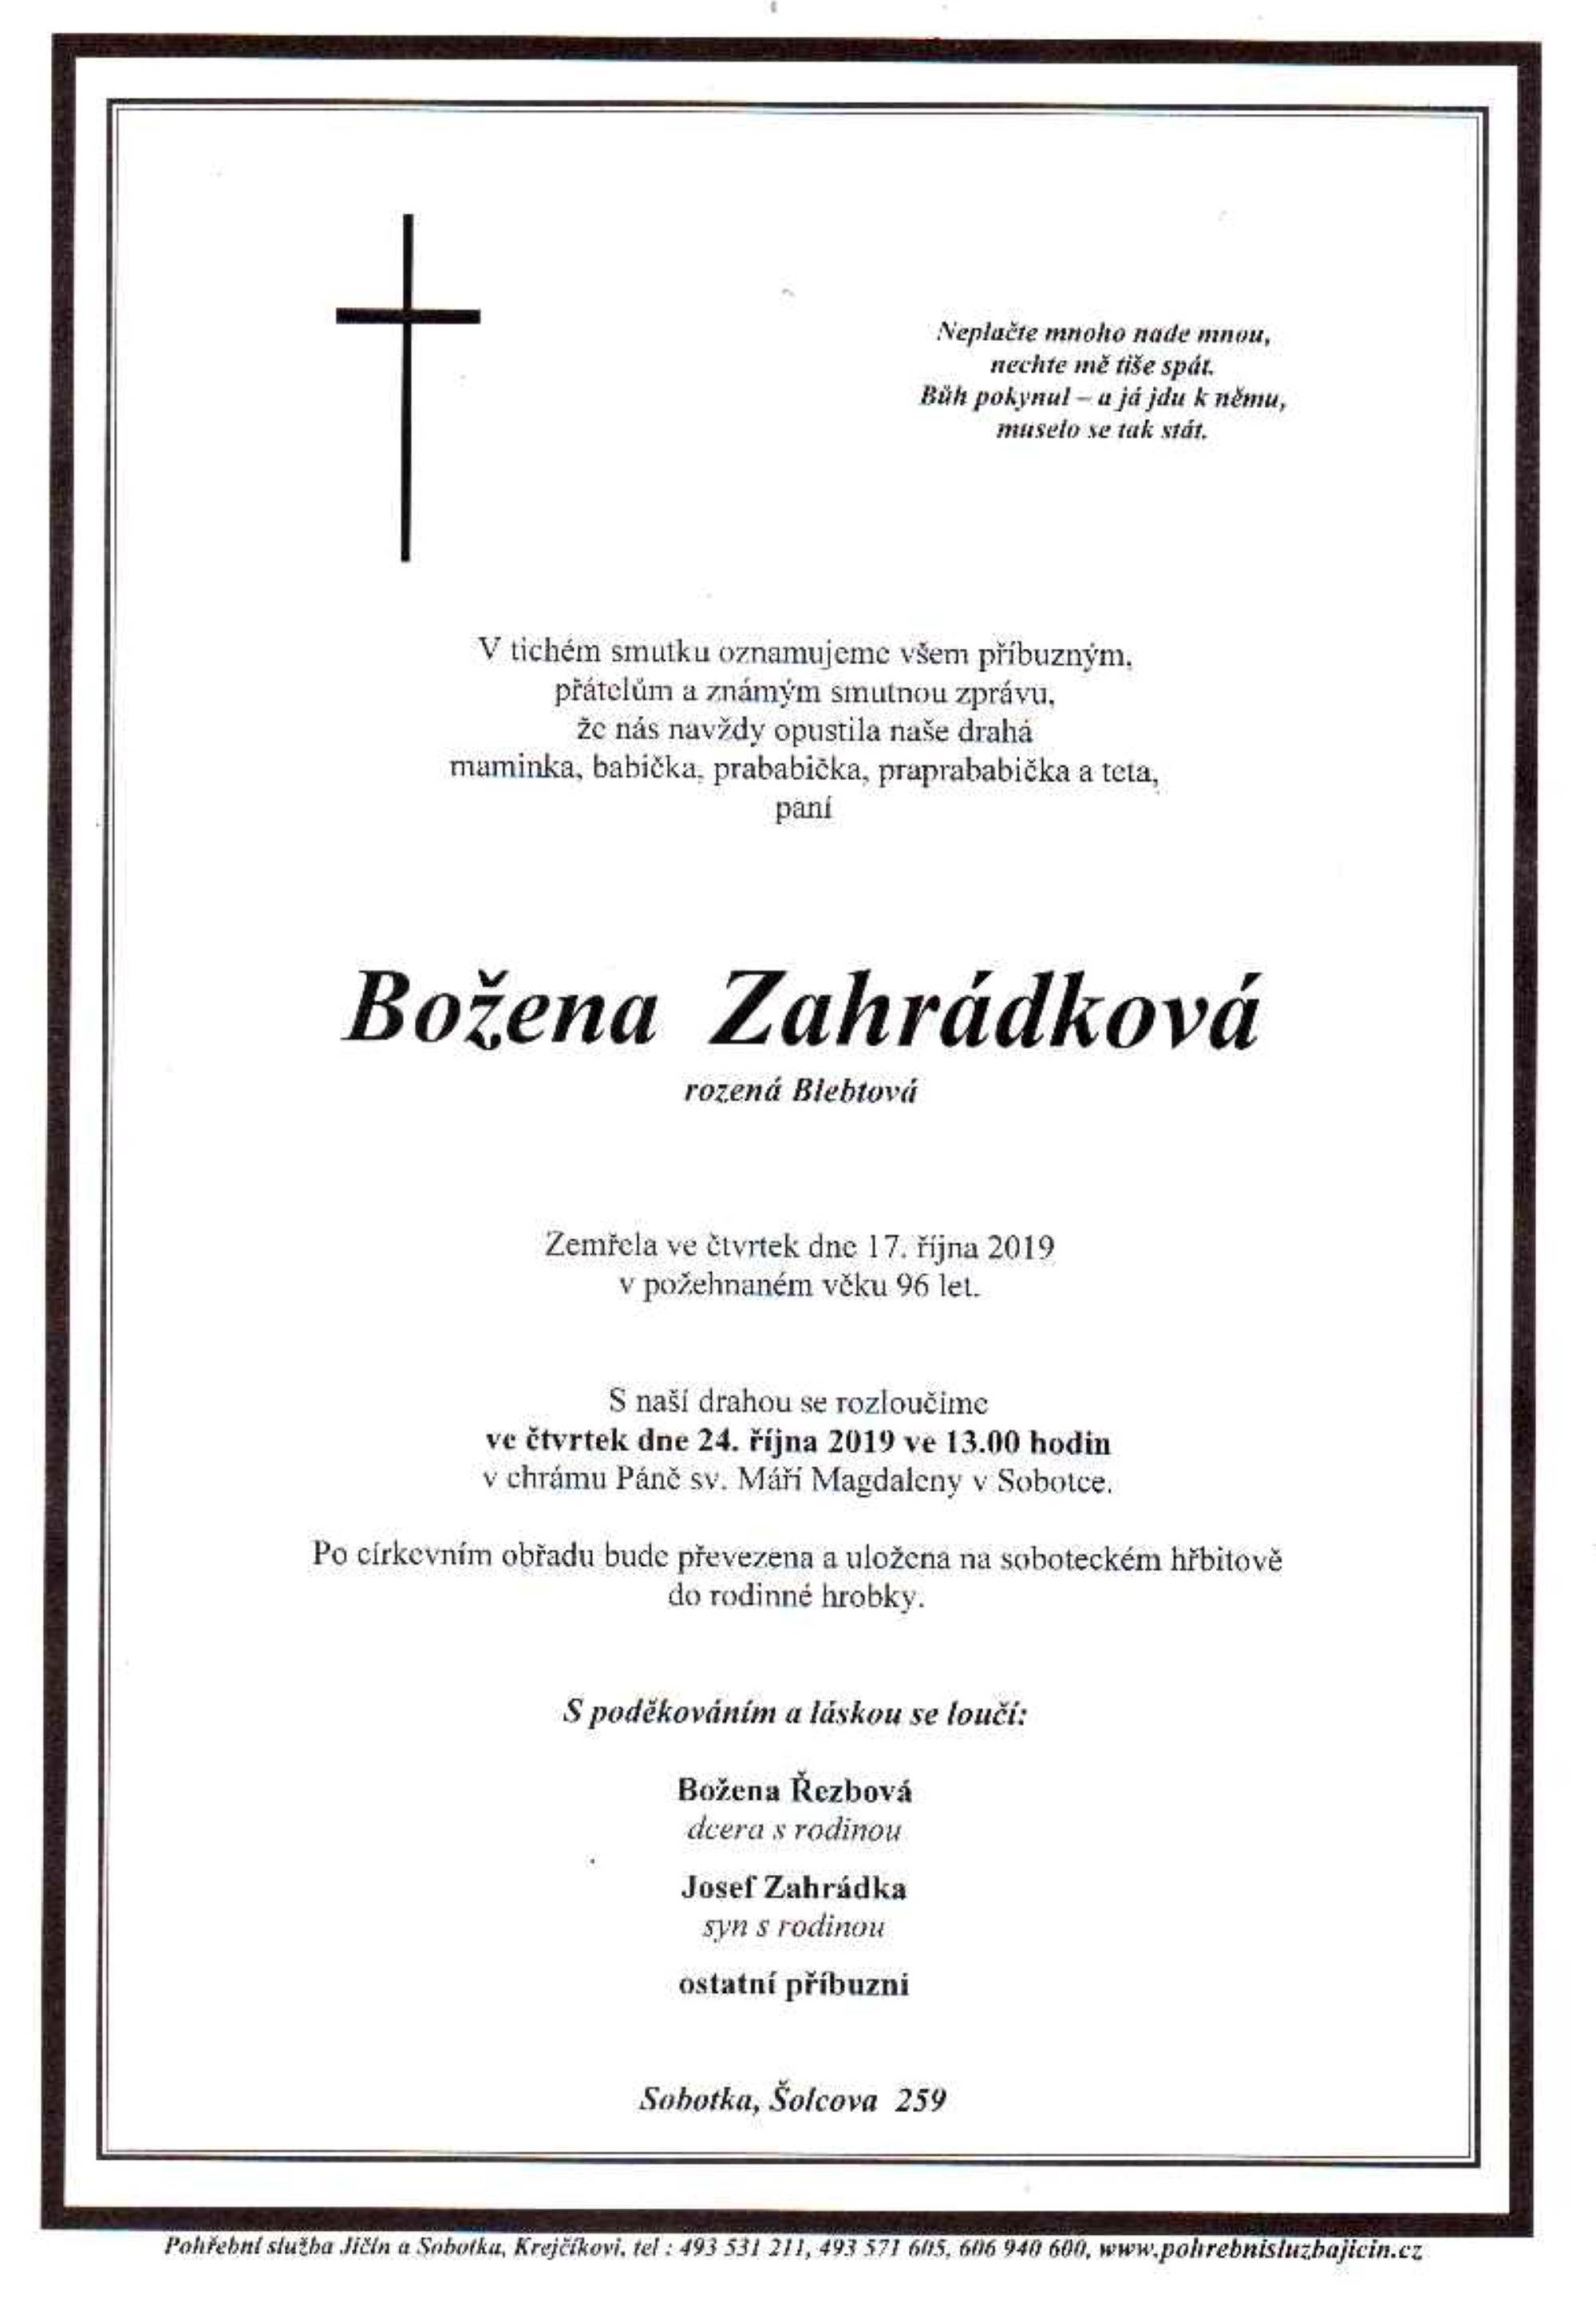 Božena Zahrádková